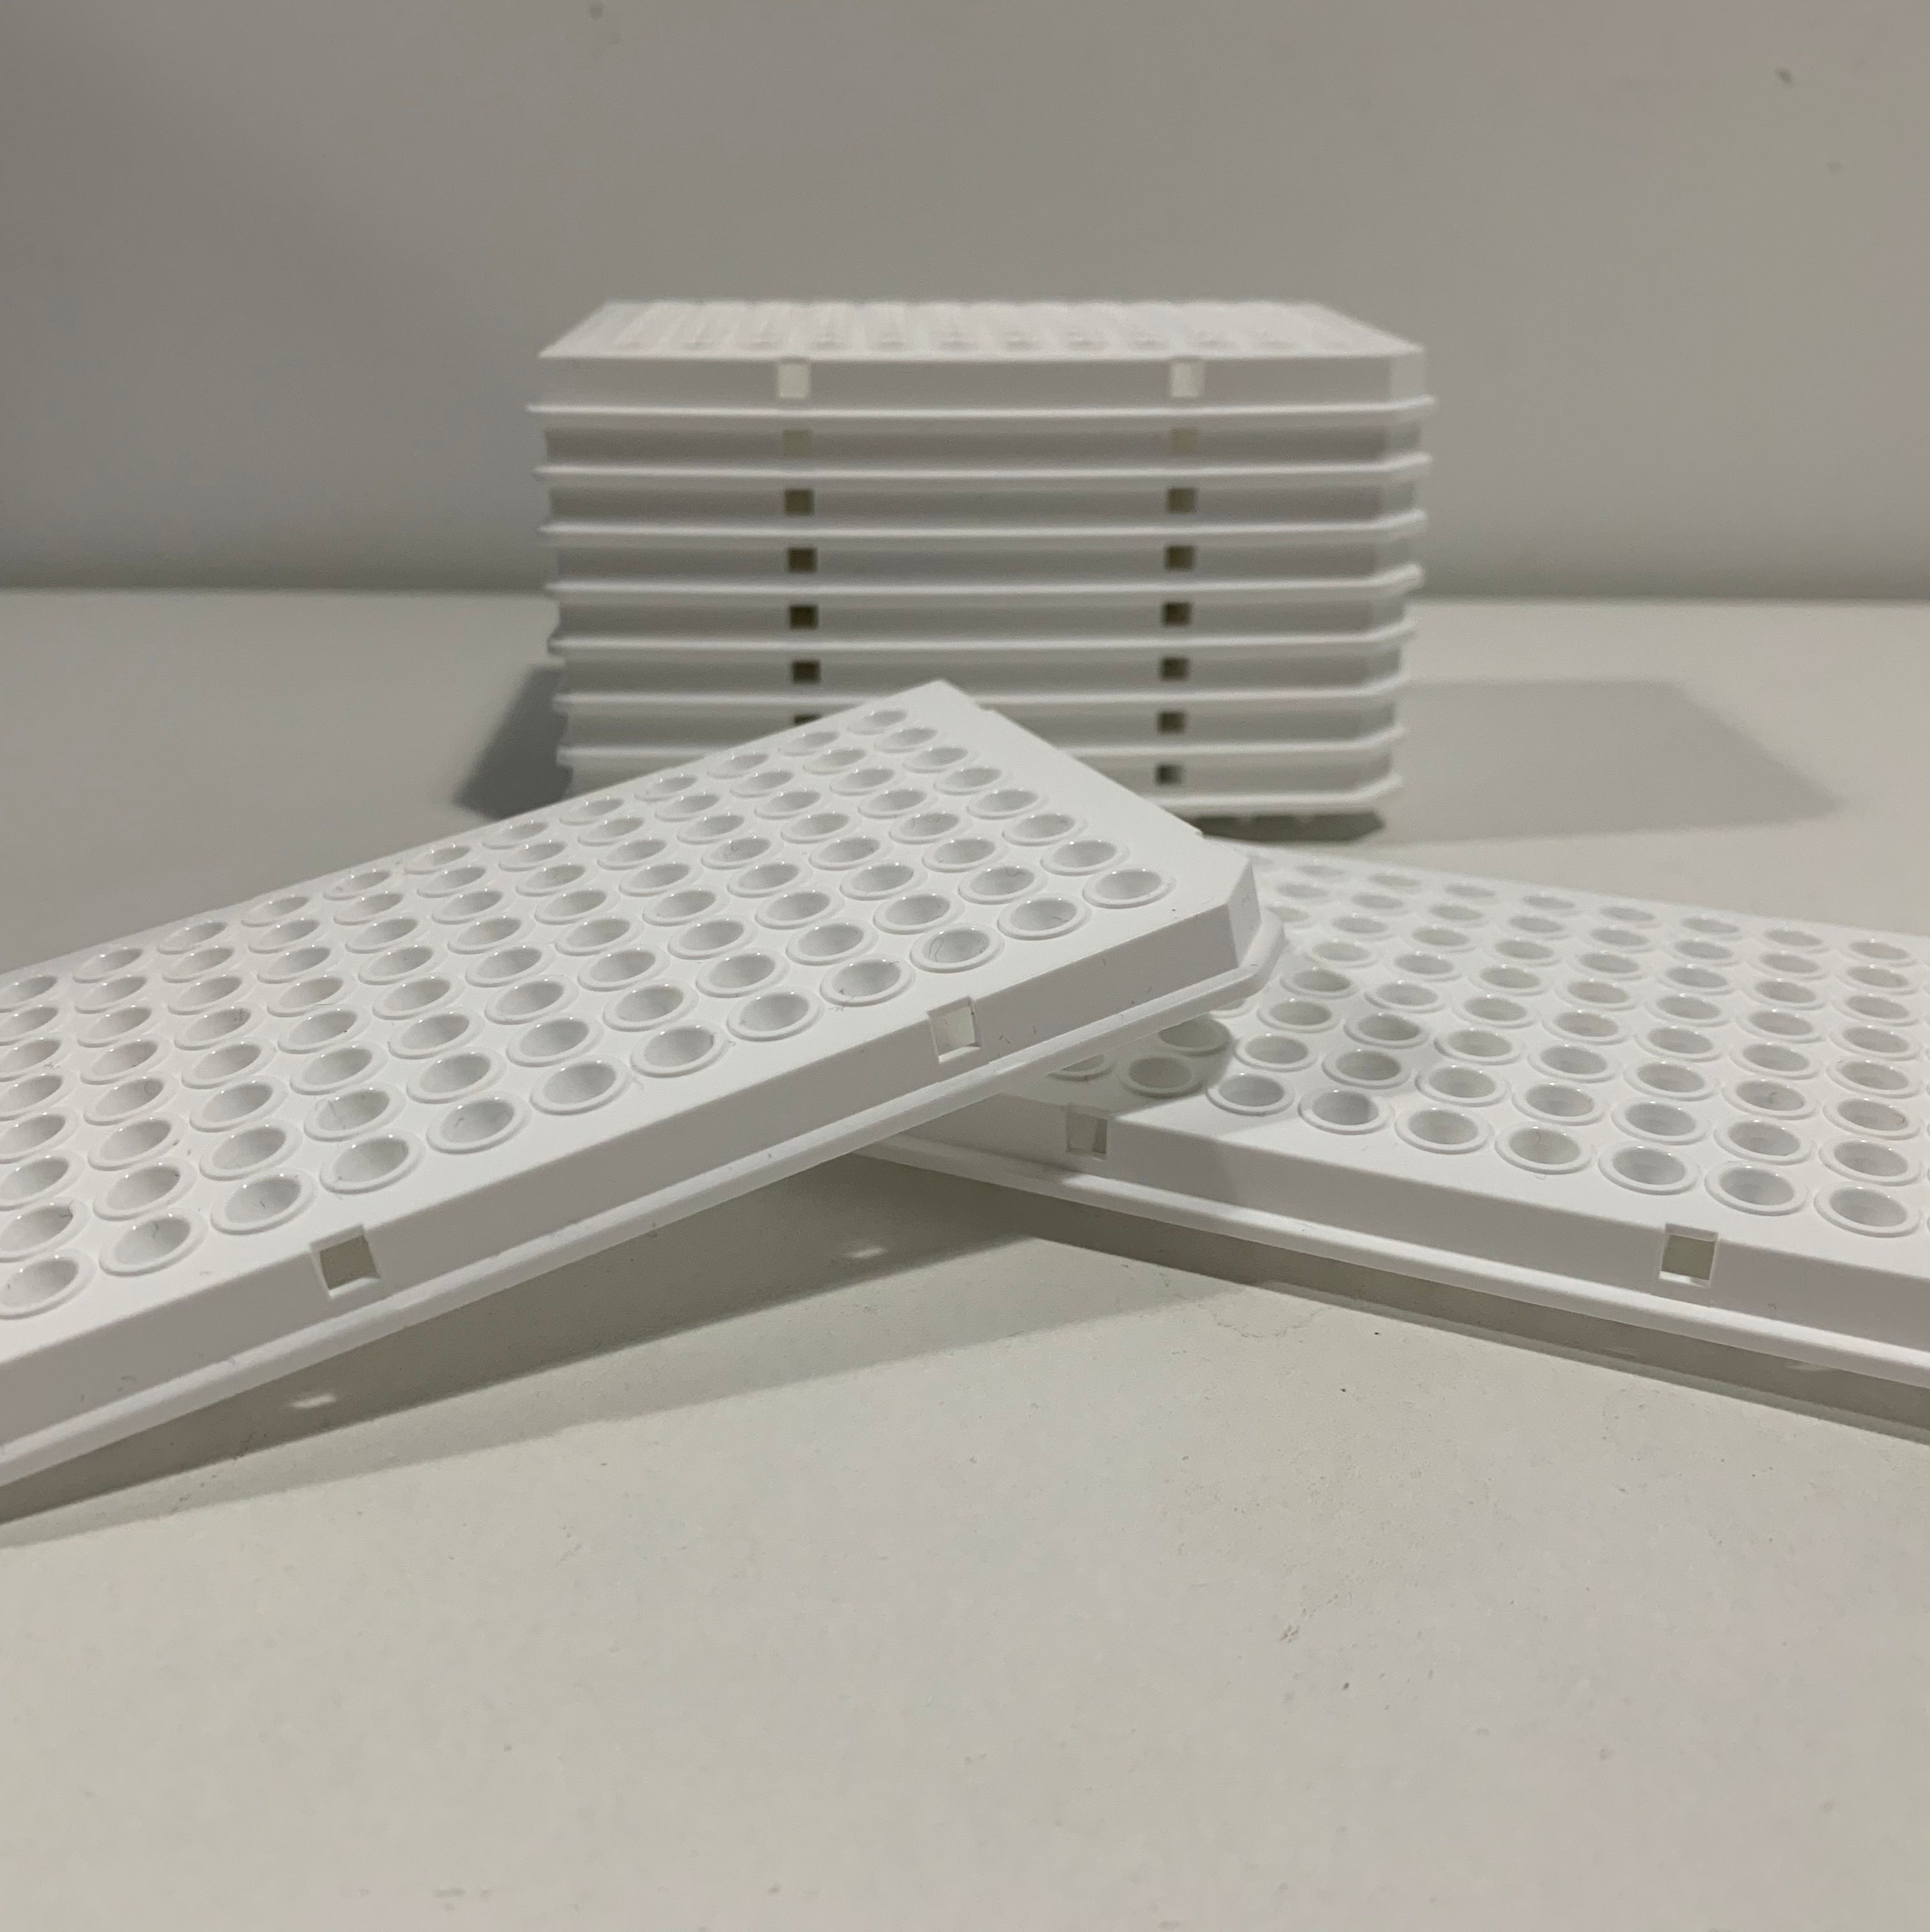 LabCope 白色96孔板完全匹配罗氏白色96孔板LC-RT-PCR-96-W 50/盒